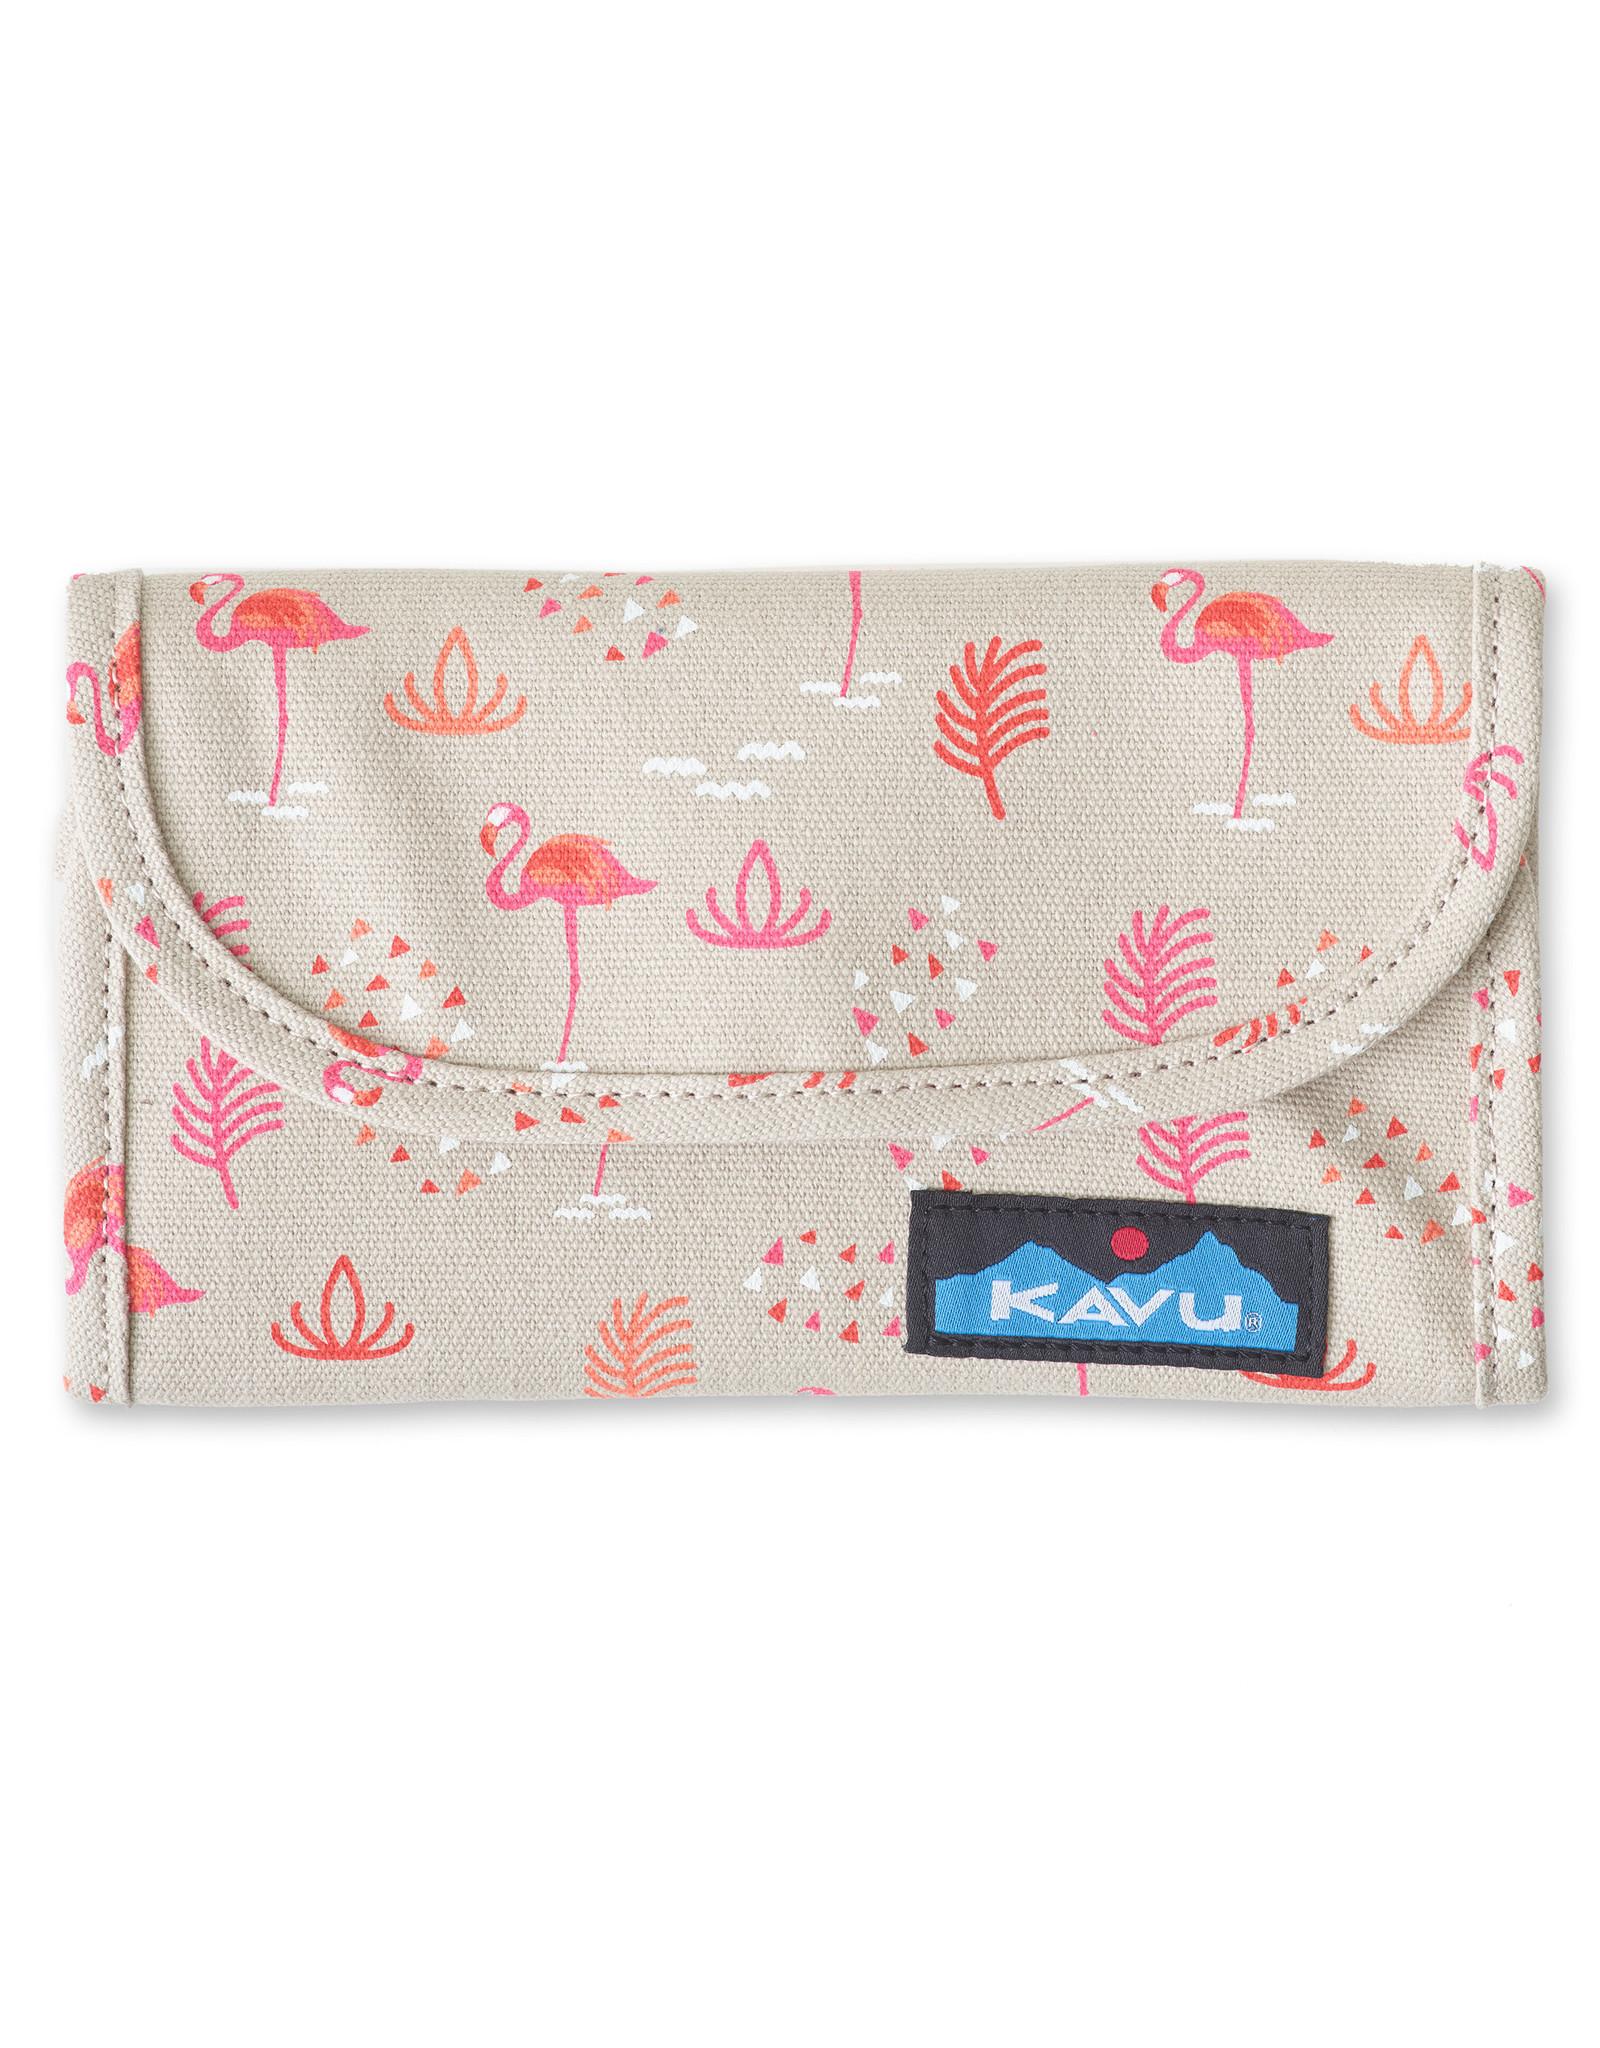 Kavu Big Spender - Chillin Flamingo